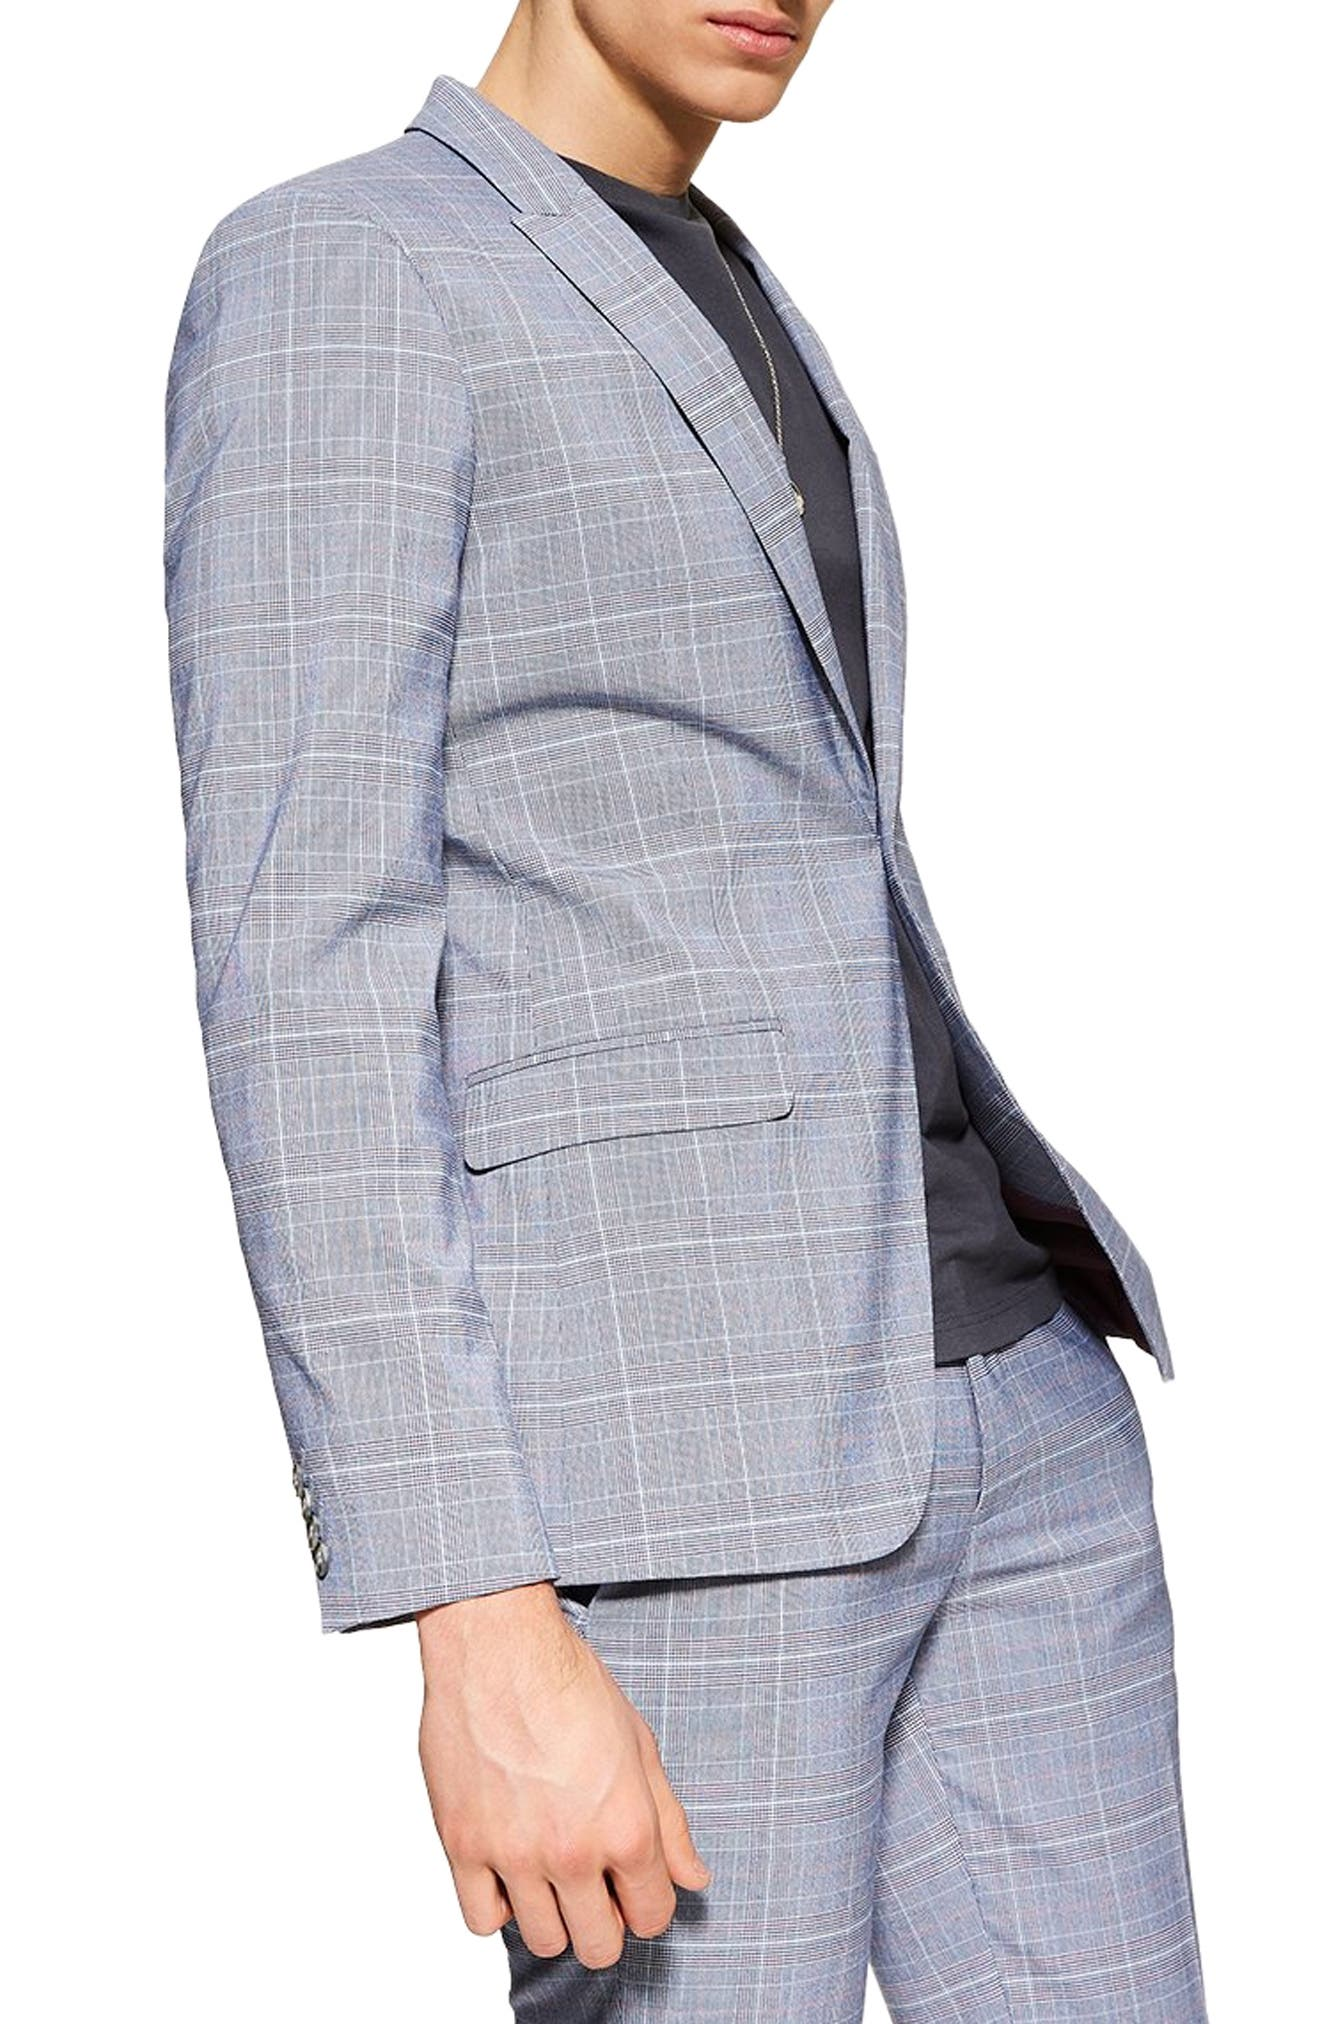 TOPMAN Skinny Fit Suit Jacket, Main, color, BLUE MULTI